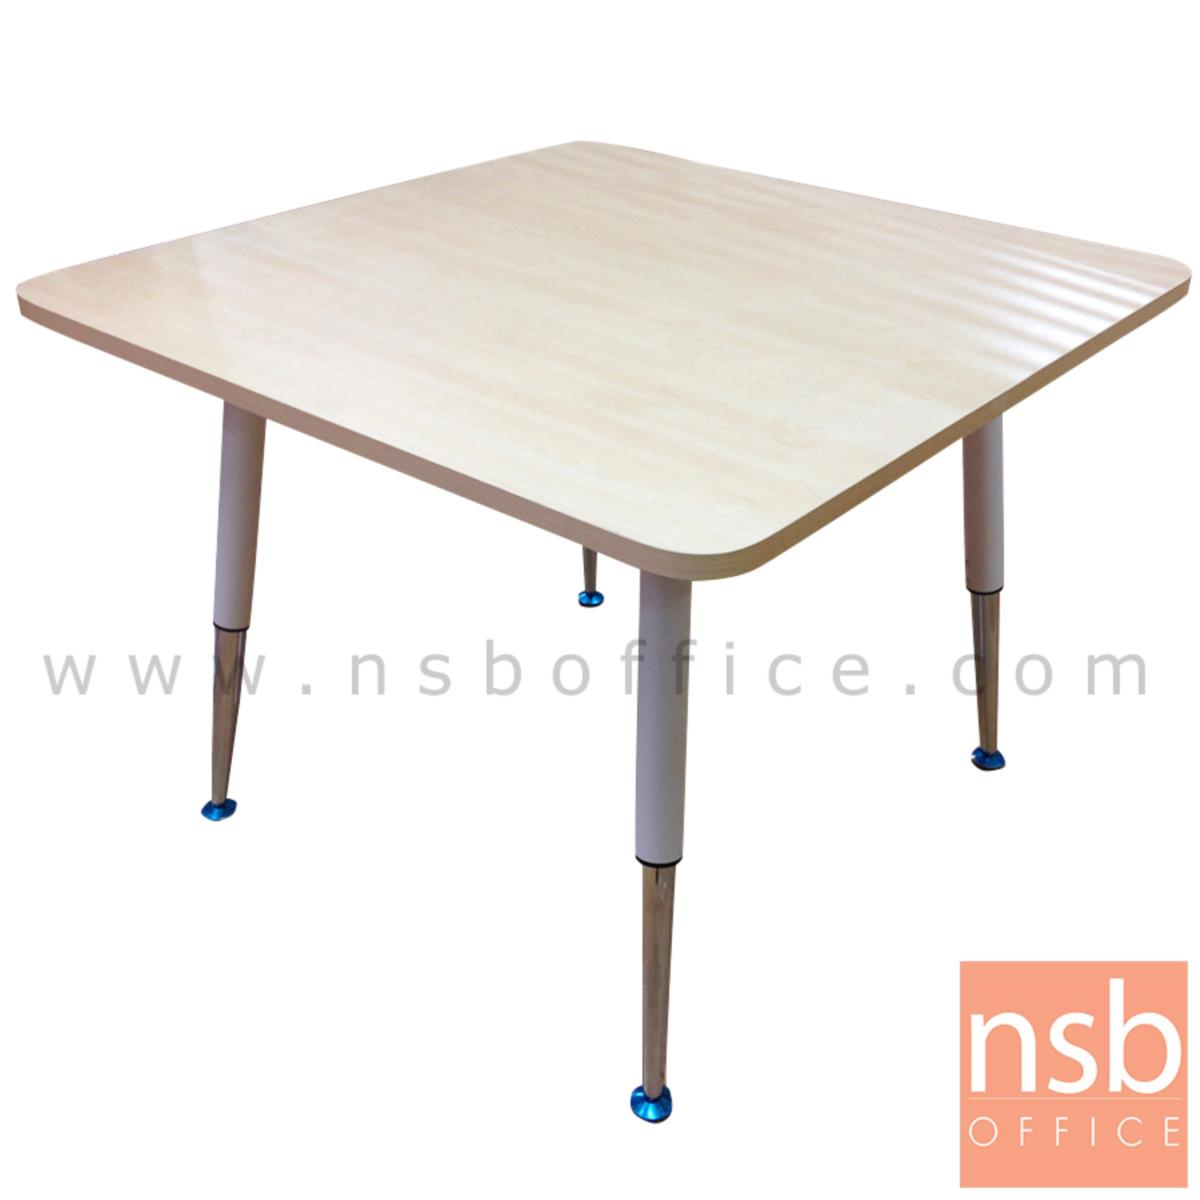 A05A125:โต๊ะประชุมทรงเหลี่ยมมุมโค้ง   ขนาด 100W cm. ขาปลายเรียวขาวตัดโครเมี่ยม